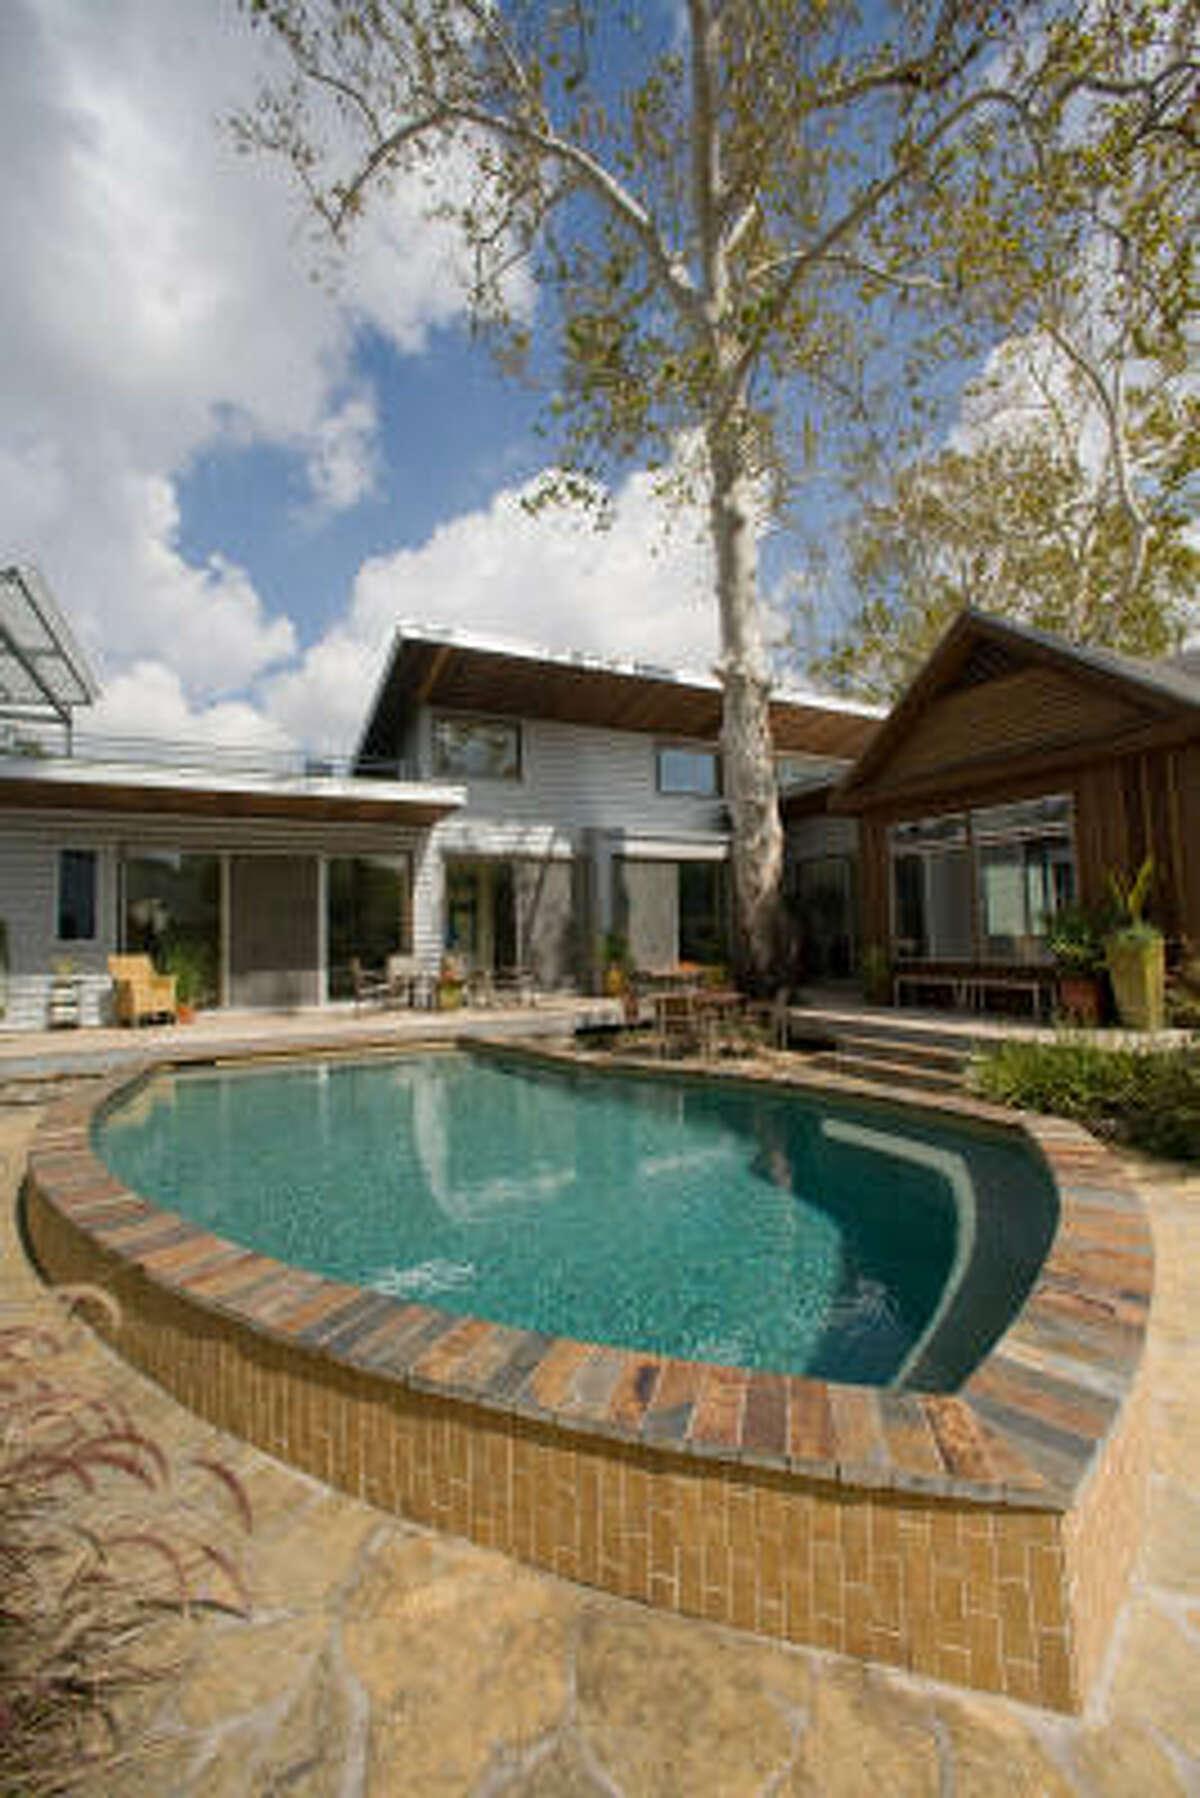 Backyard pool in Houston.